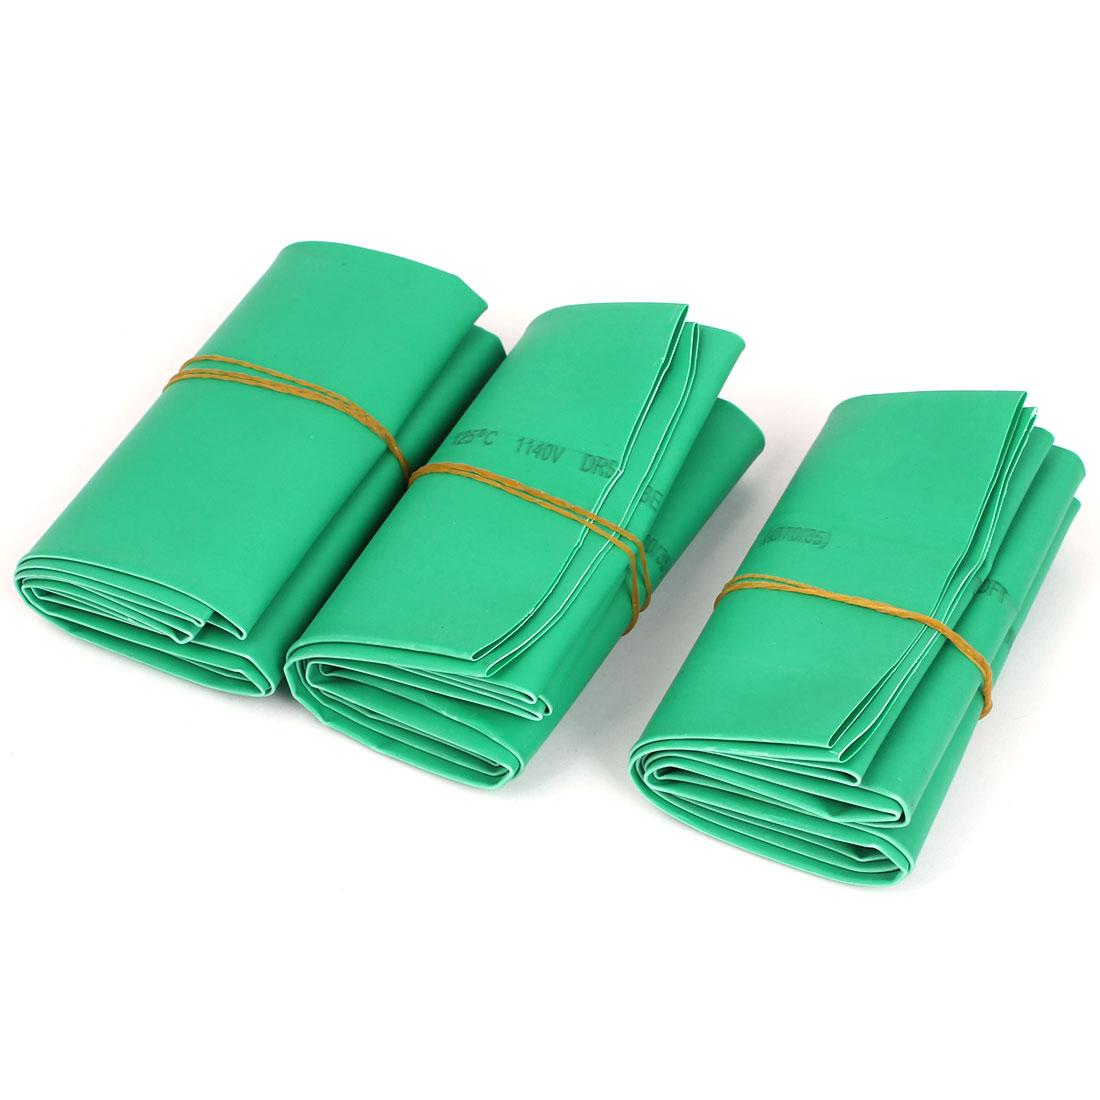 Green 70mm Diameter 2:1 Polyolefin Tube Sleeving Heat Shrink Tubing 1M 3pcs